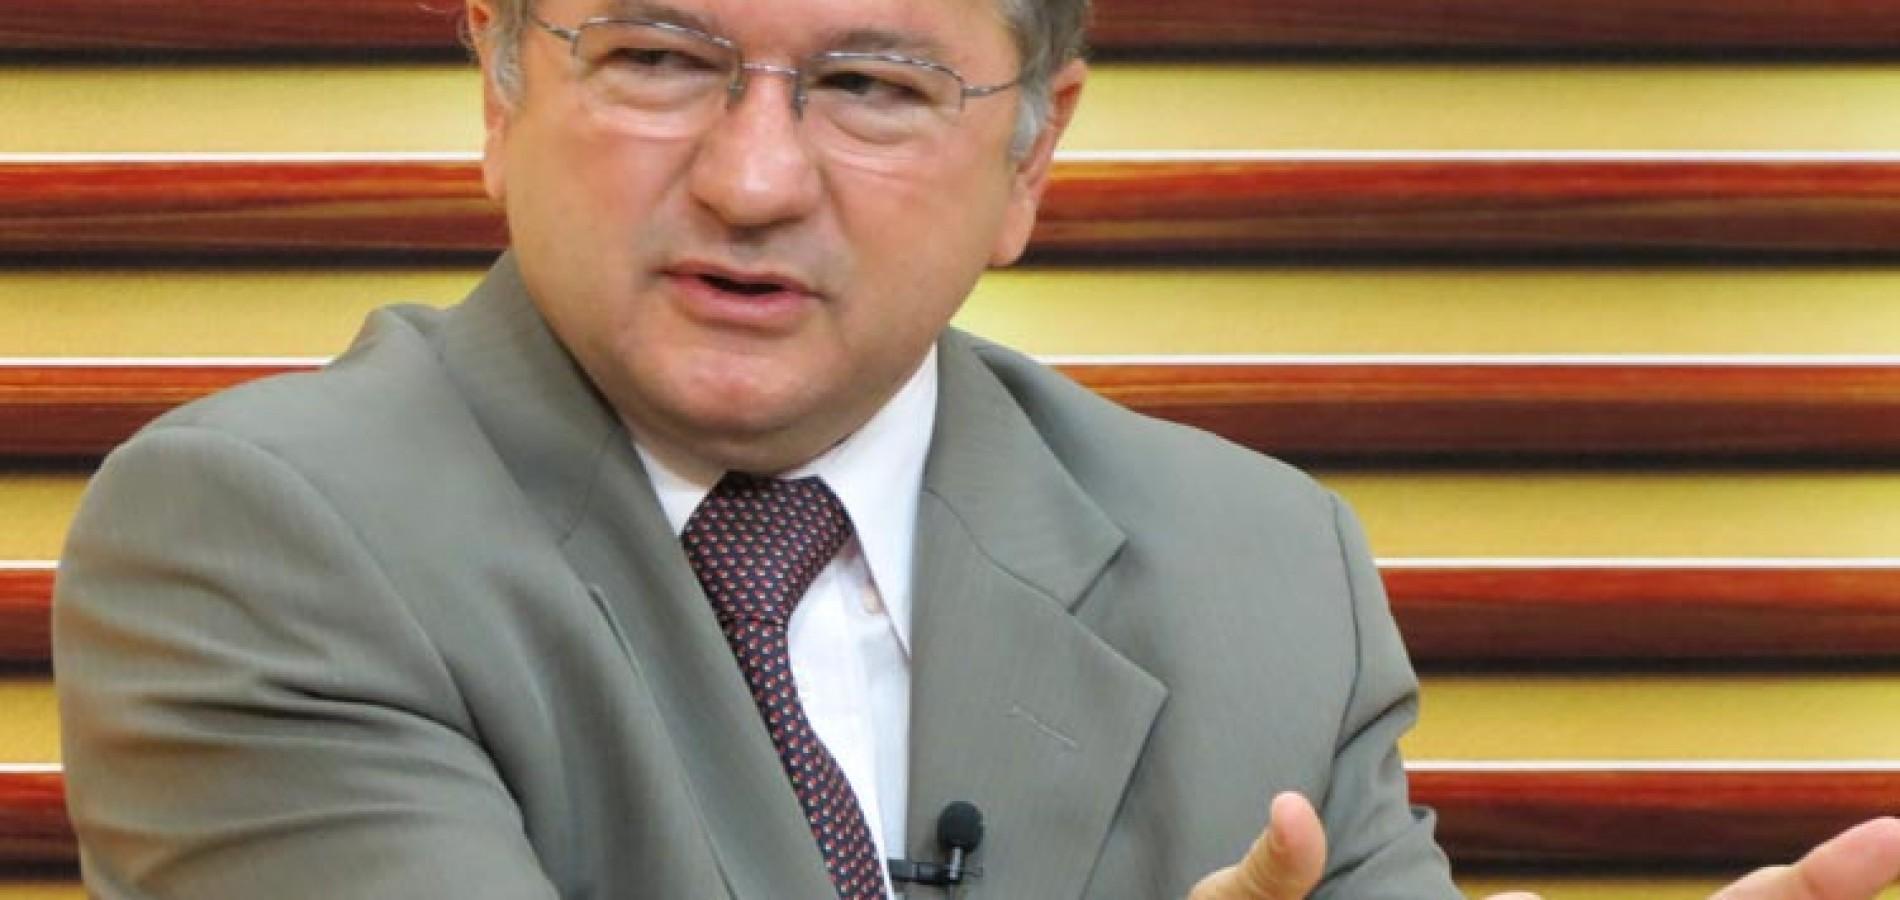 Merlong Solano poderá ocupar secretaria no novo governo petista